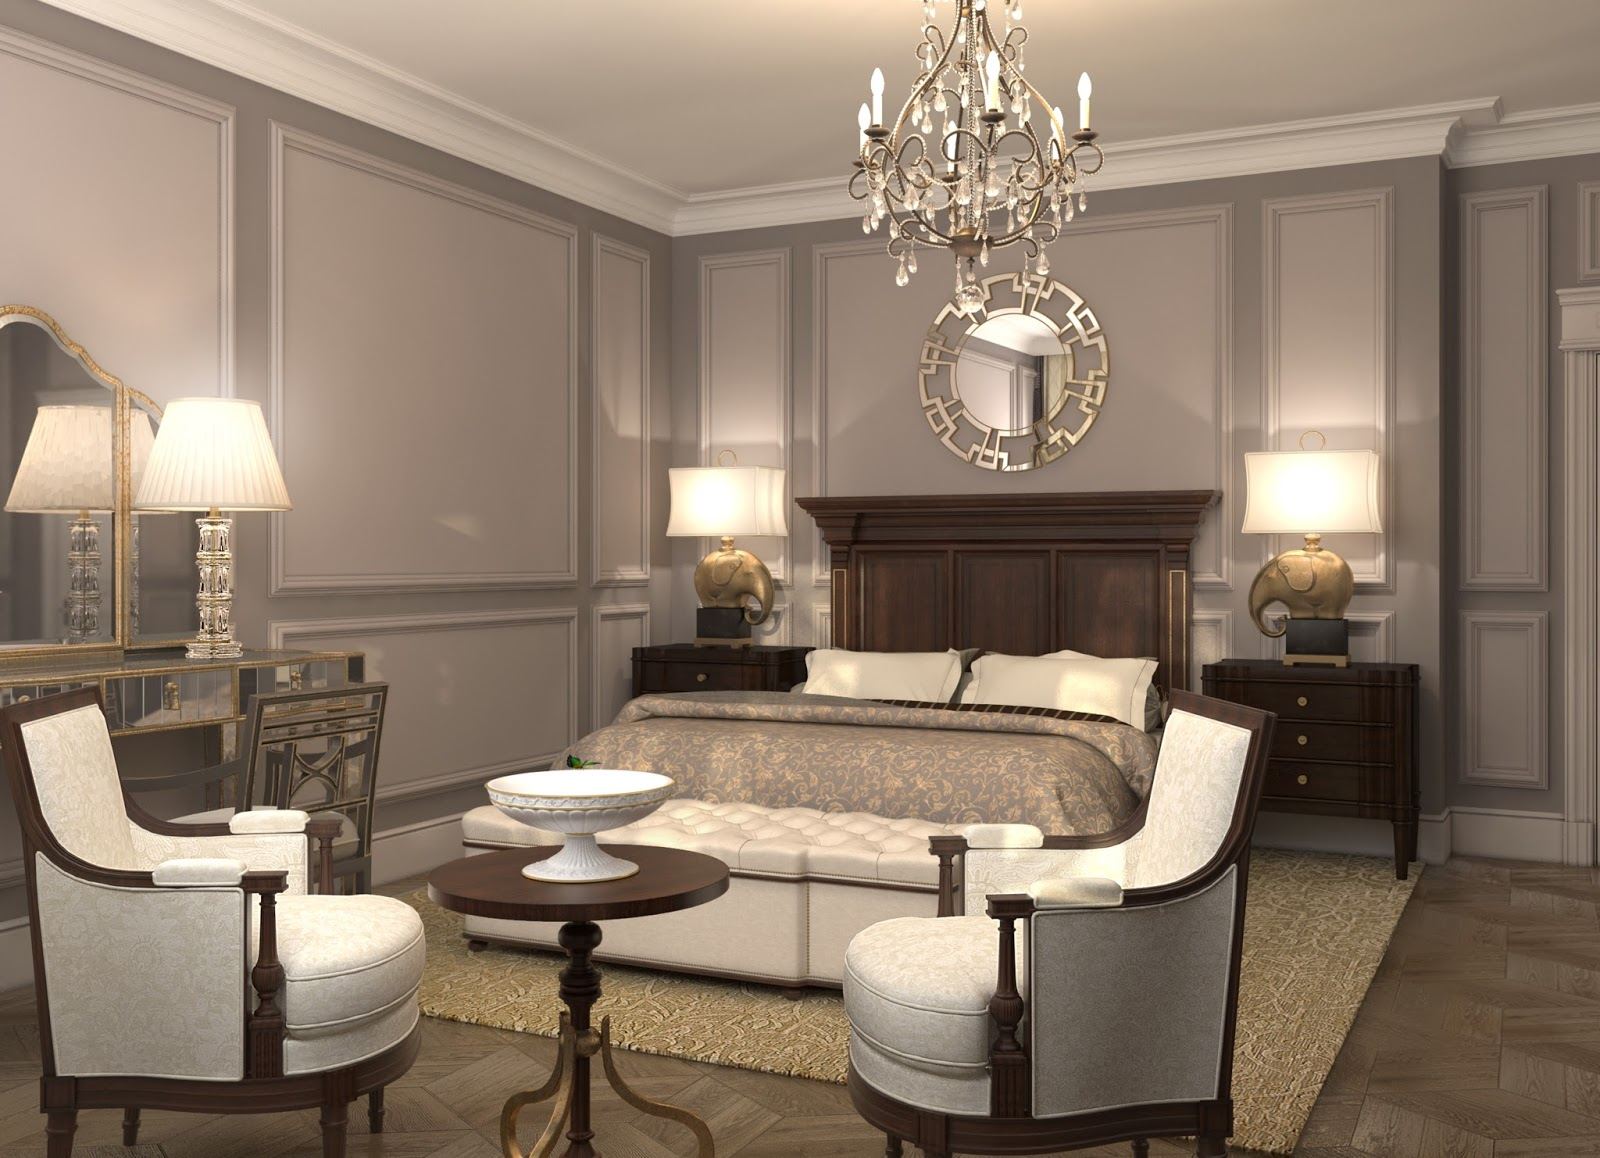 Darya Girina Interior Design: Interior design of Lux ...